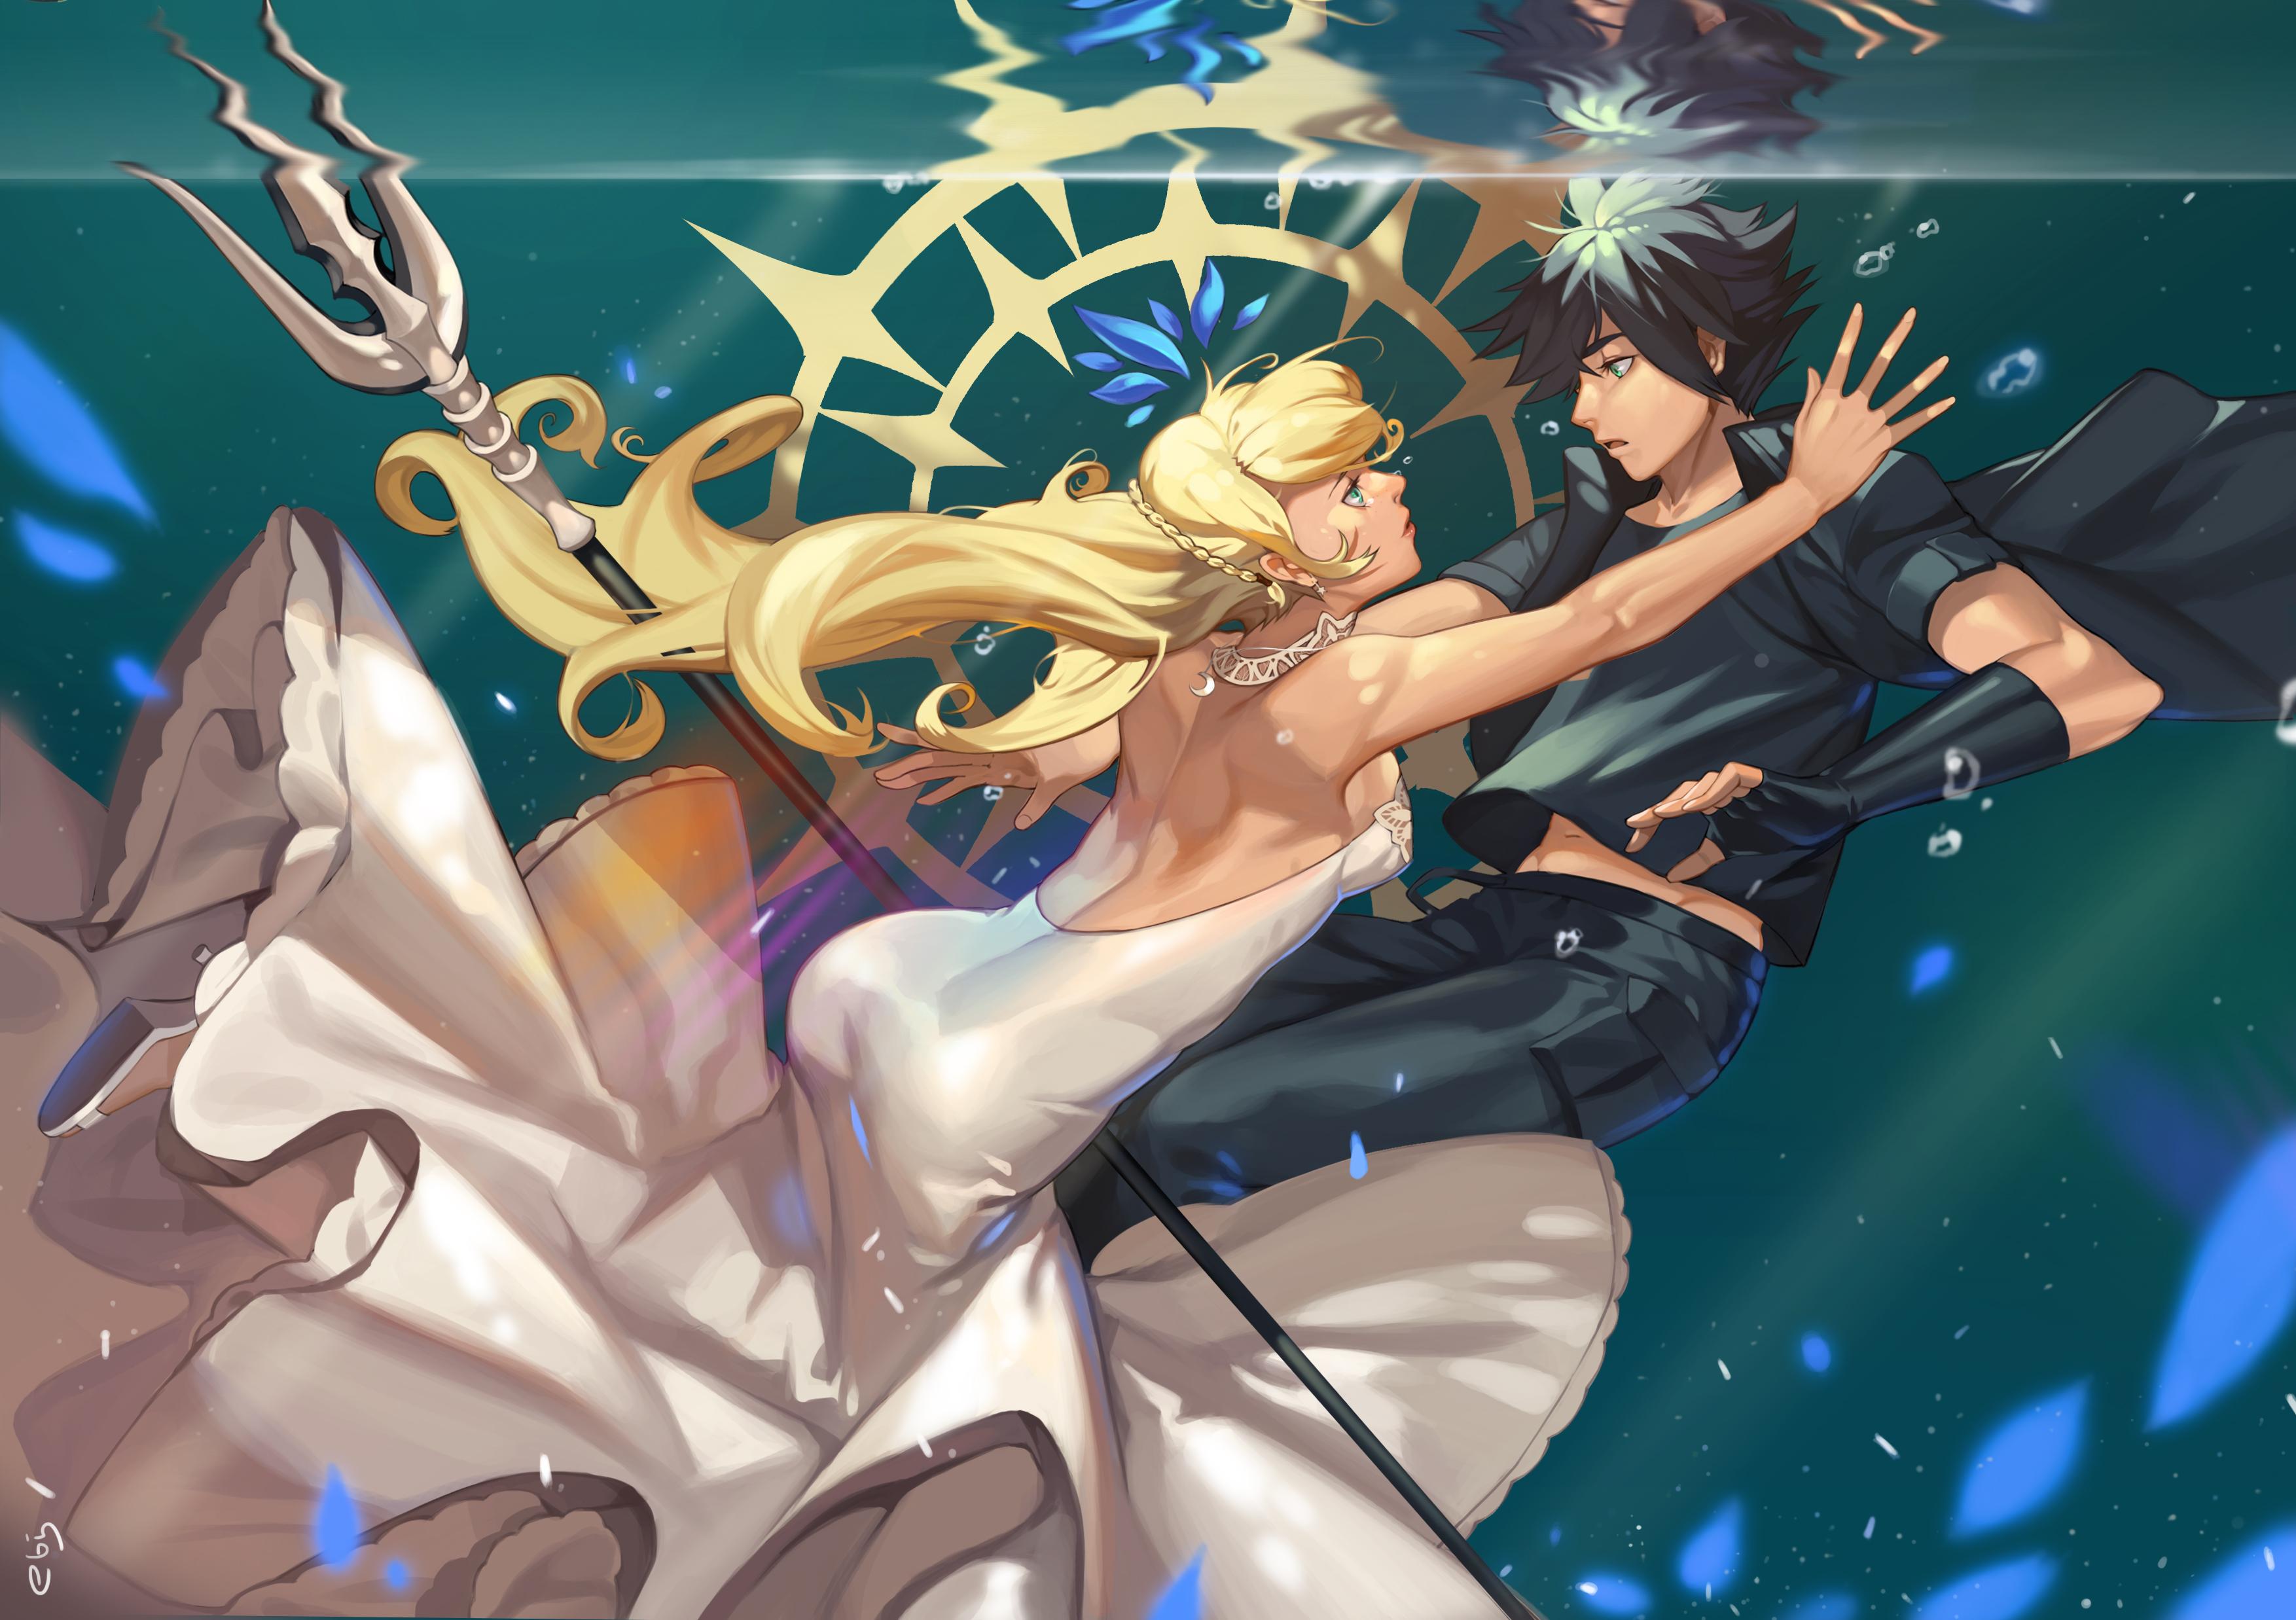 Noctis Final Fantasy Xv Hd Games 4k Wallpapers Images: Final Fantasy XV HD Wallpaper